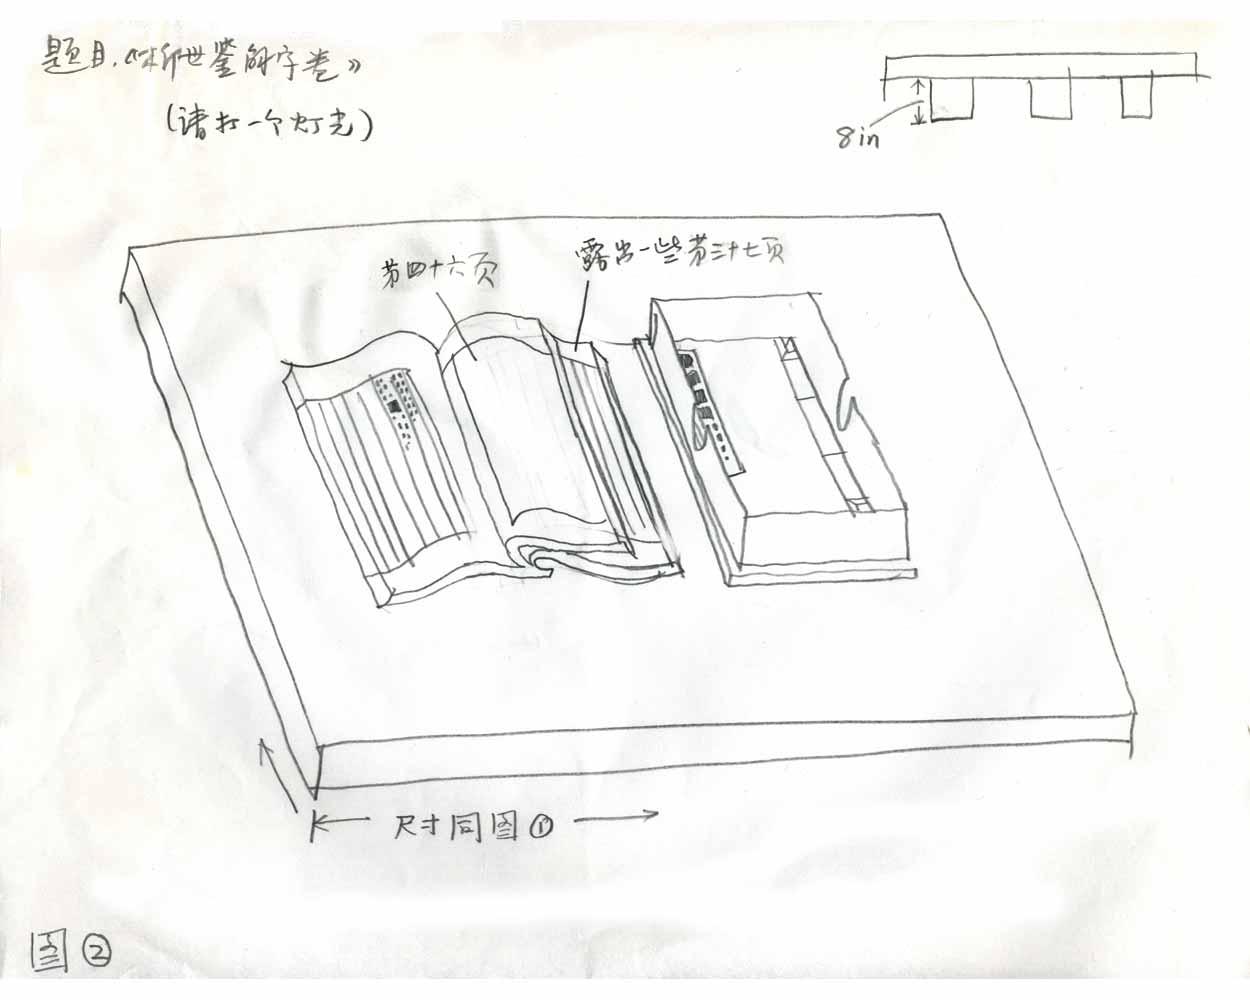 Bing Xu's project plan, pg 2